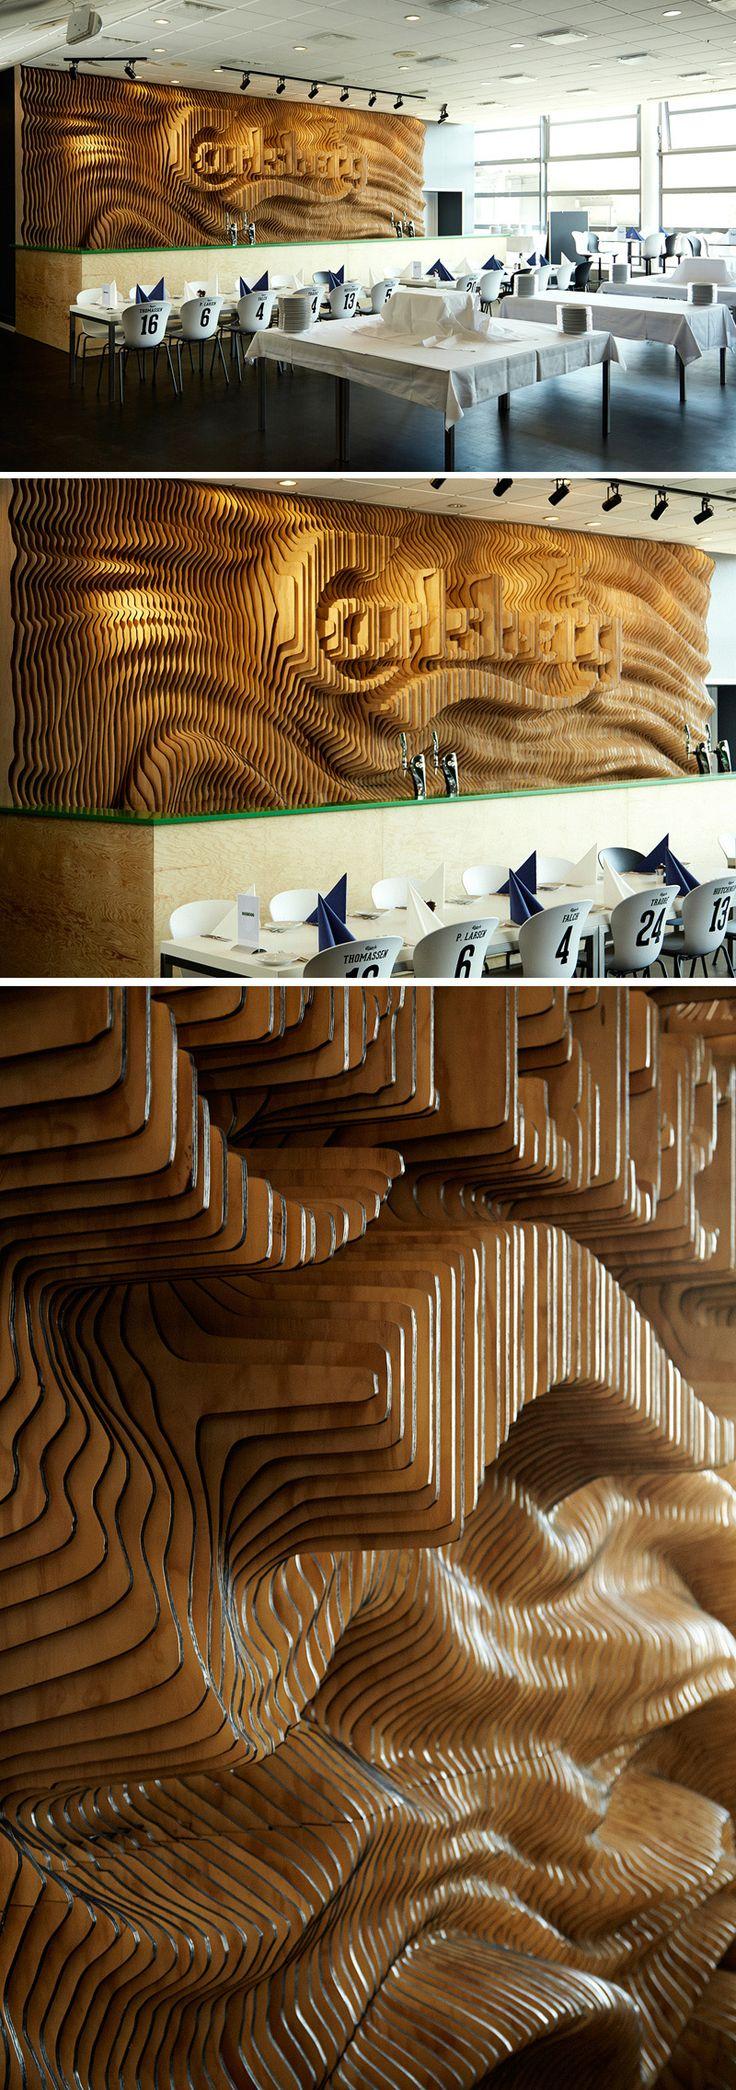 Best 25+ Lazer cut wood ideas on Pinterest | Laser cutter ideas ...